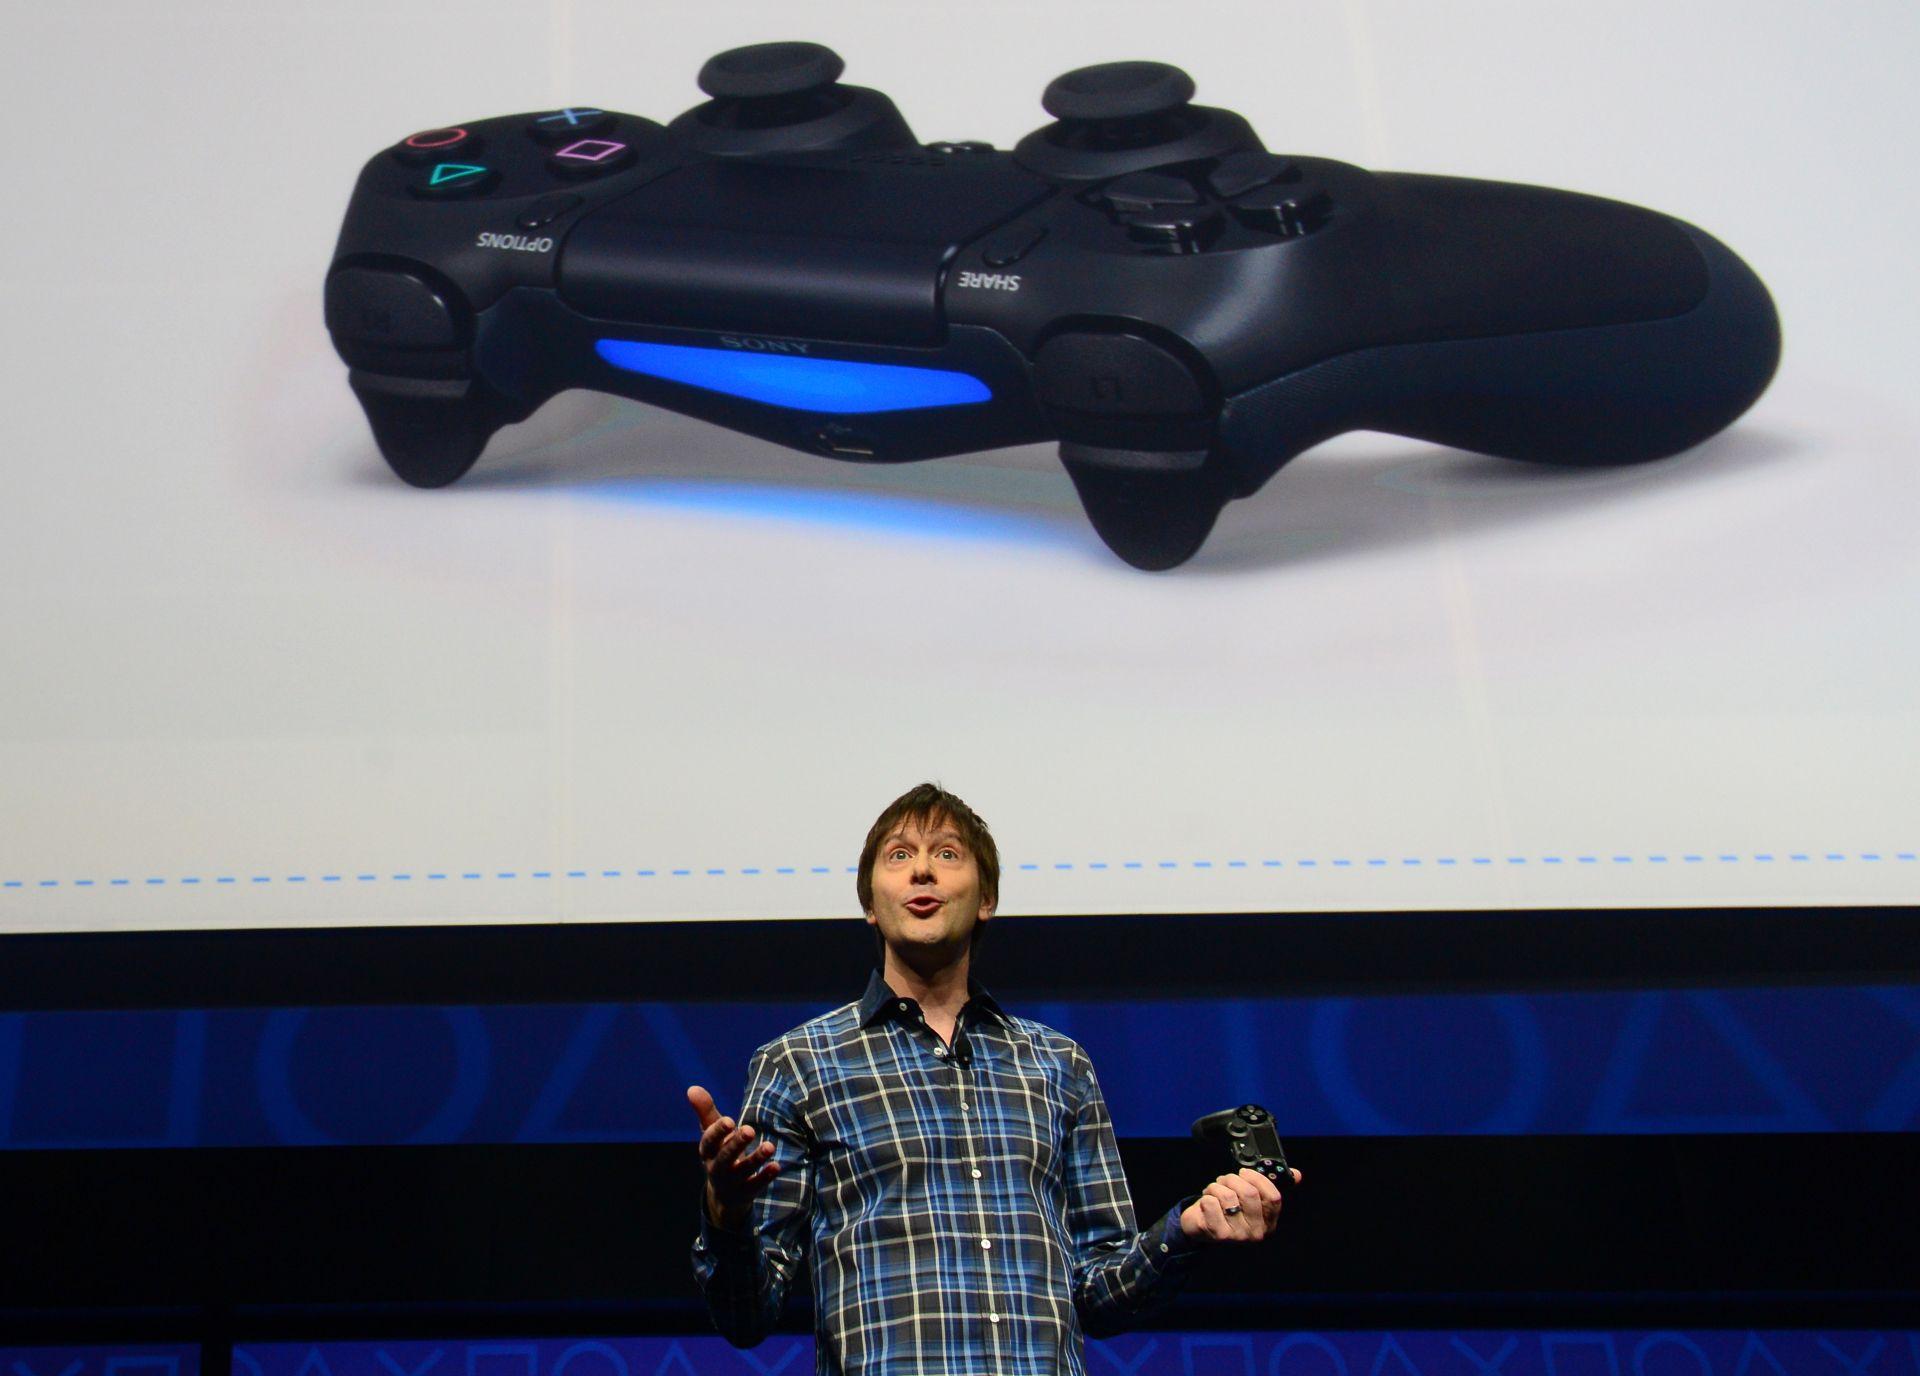 PlayStation 4 designer Mark Cerny introducing the PlayStation 4 in February 2013. u2014 AFP Relaxnews